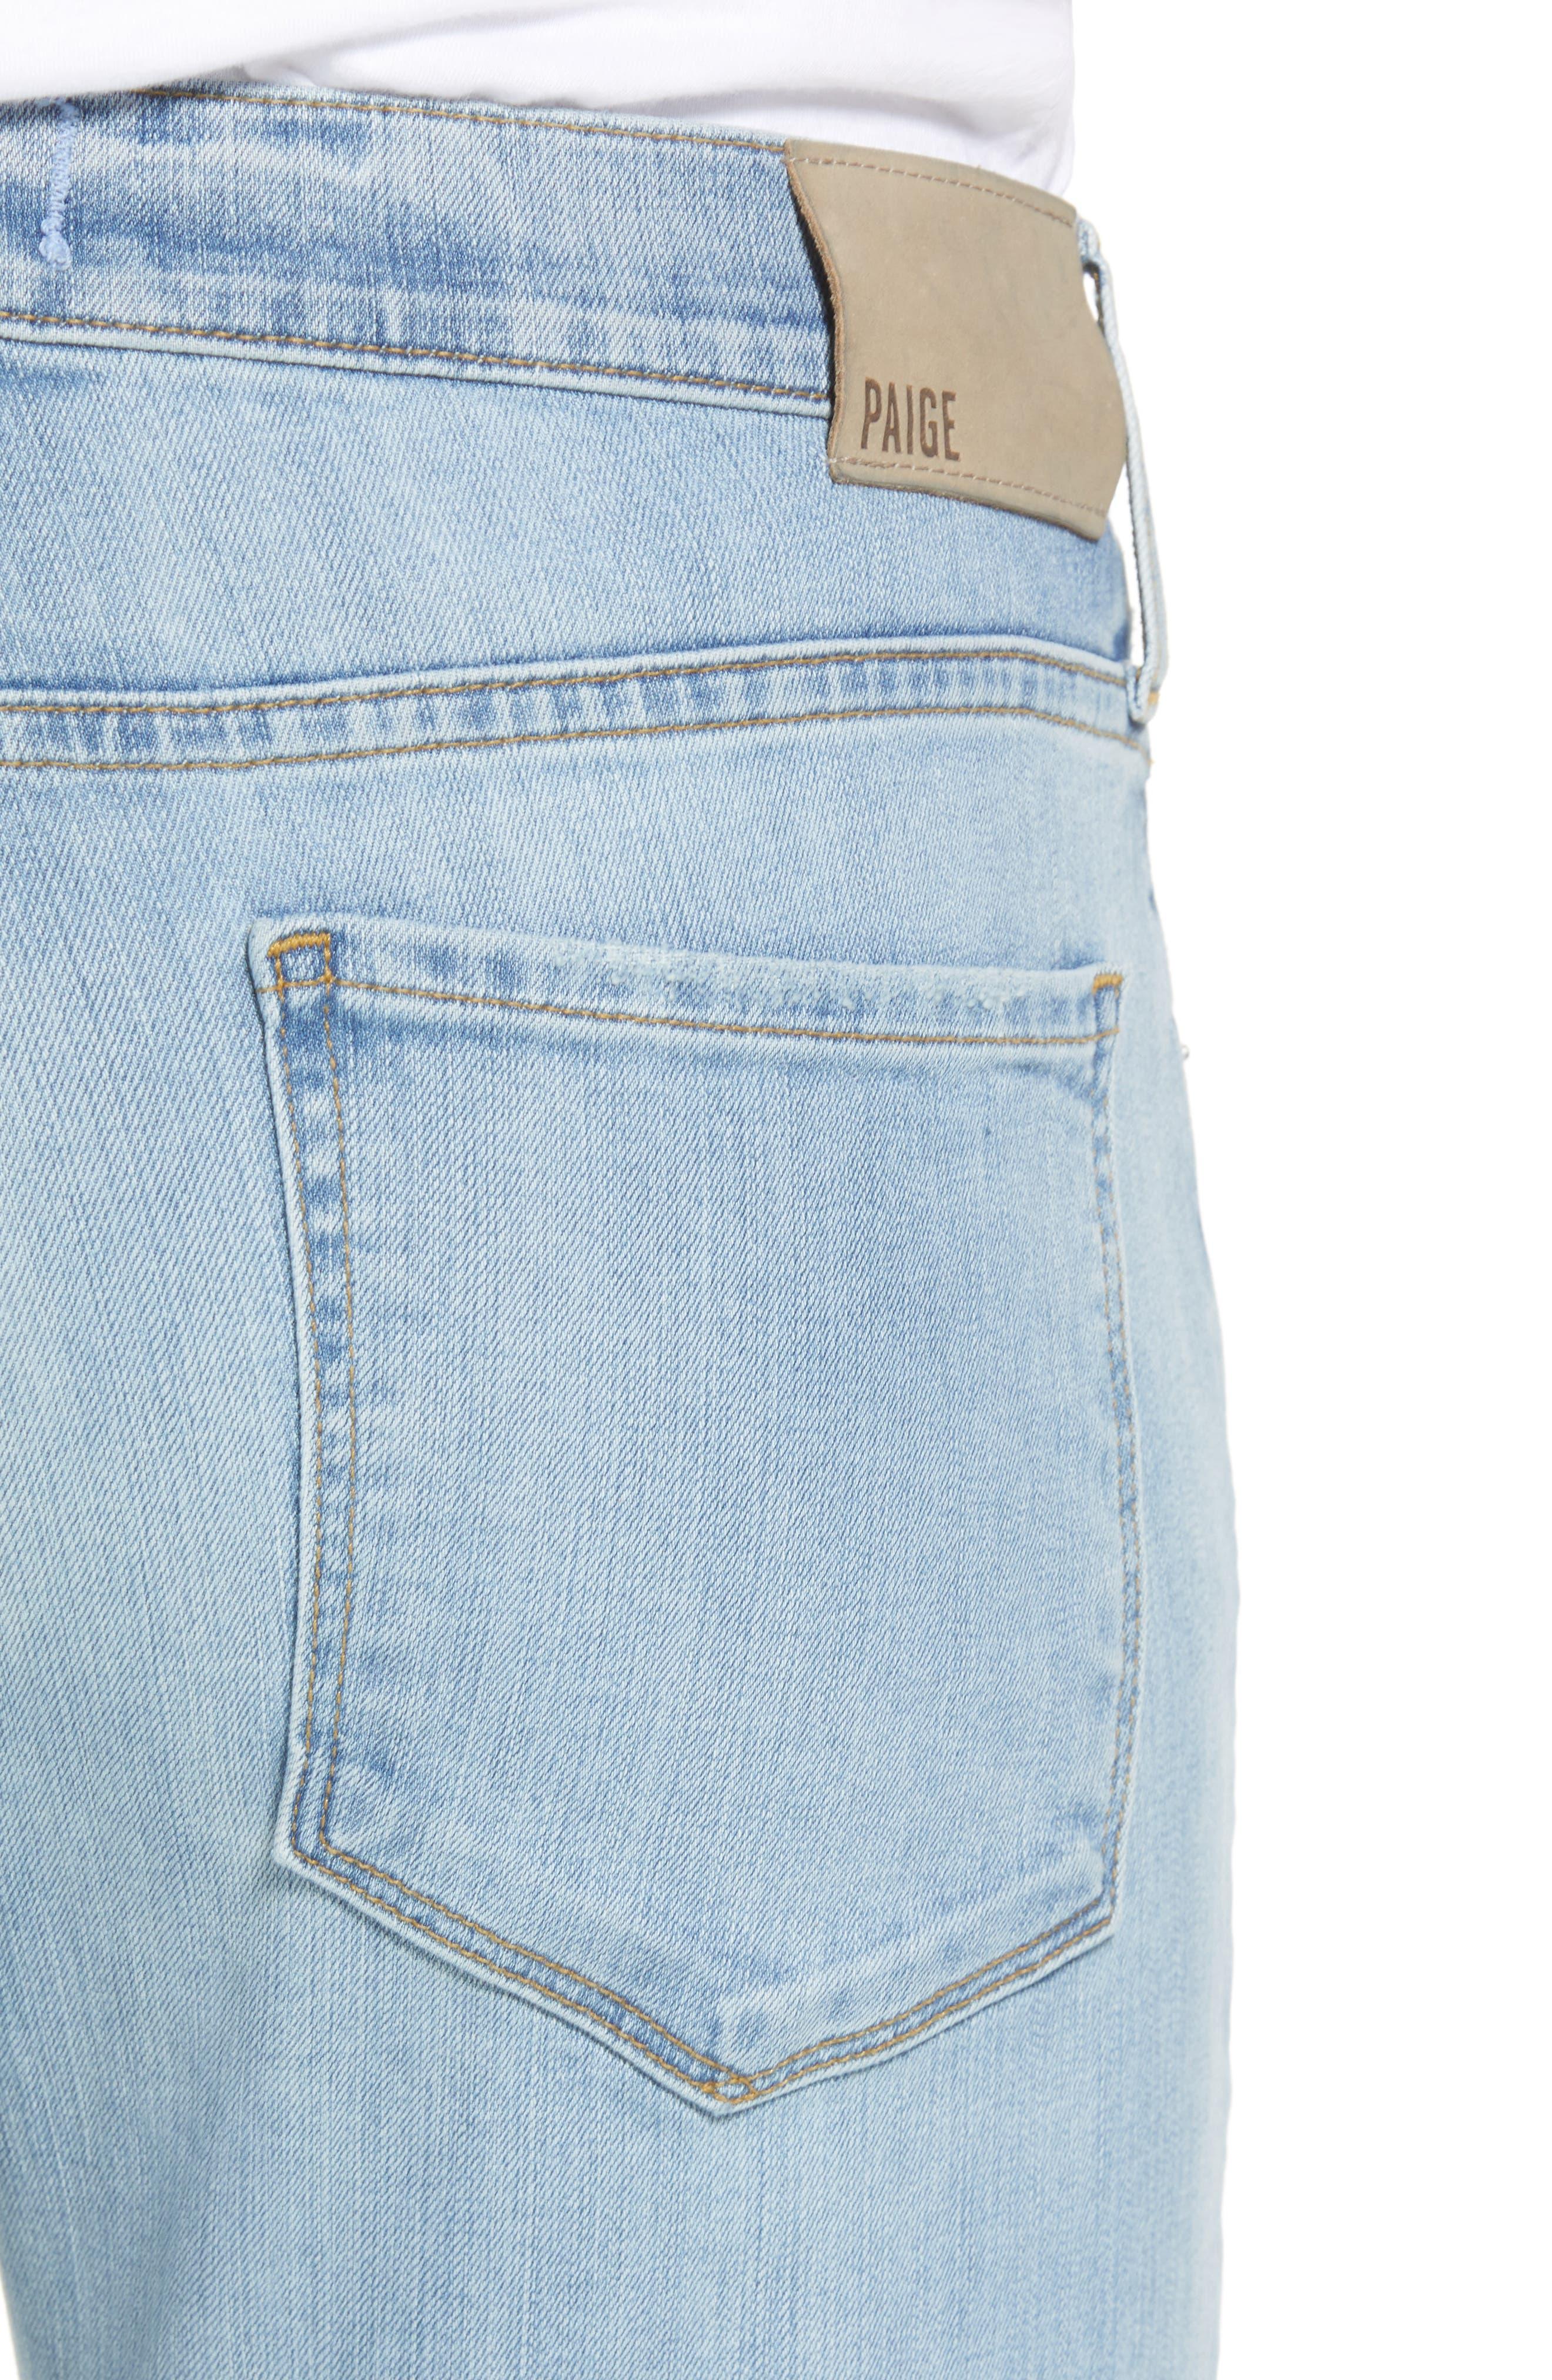 Lennox Slim Fit Jeans,                             Alternate thumbnail 5, color,                             County Destructed